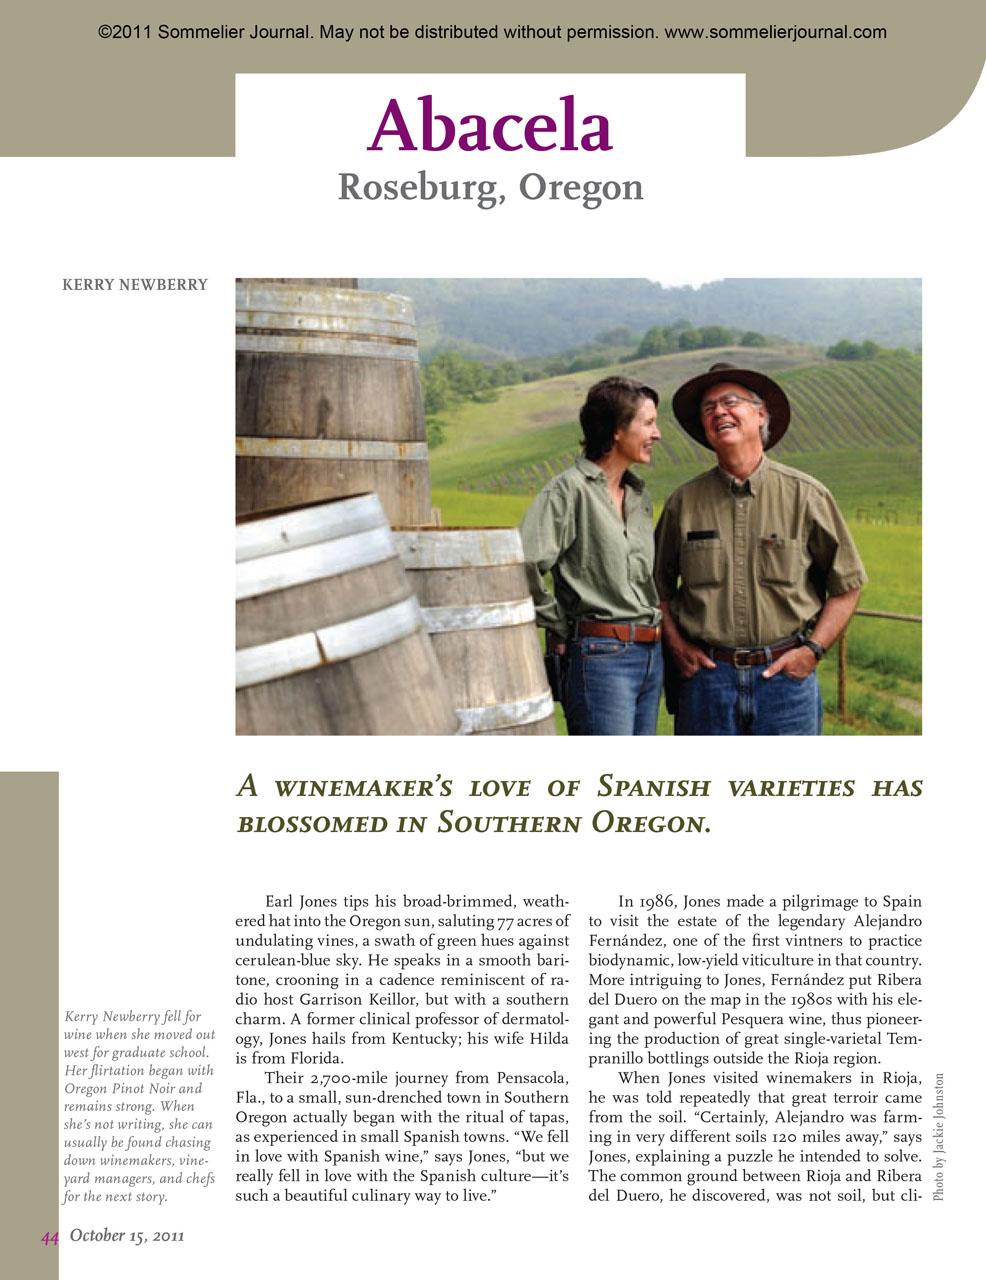 Winery Spotlight: Abacela, Roseburg, Oregon